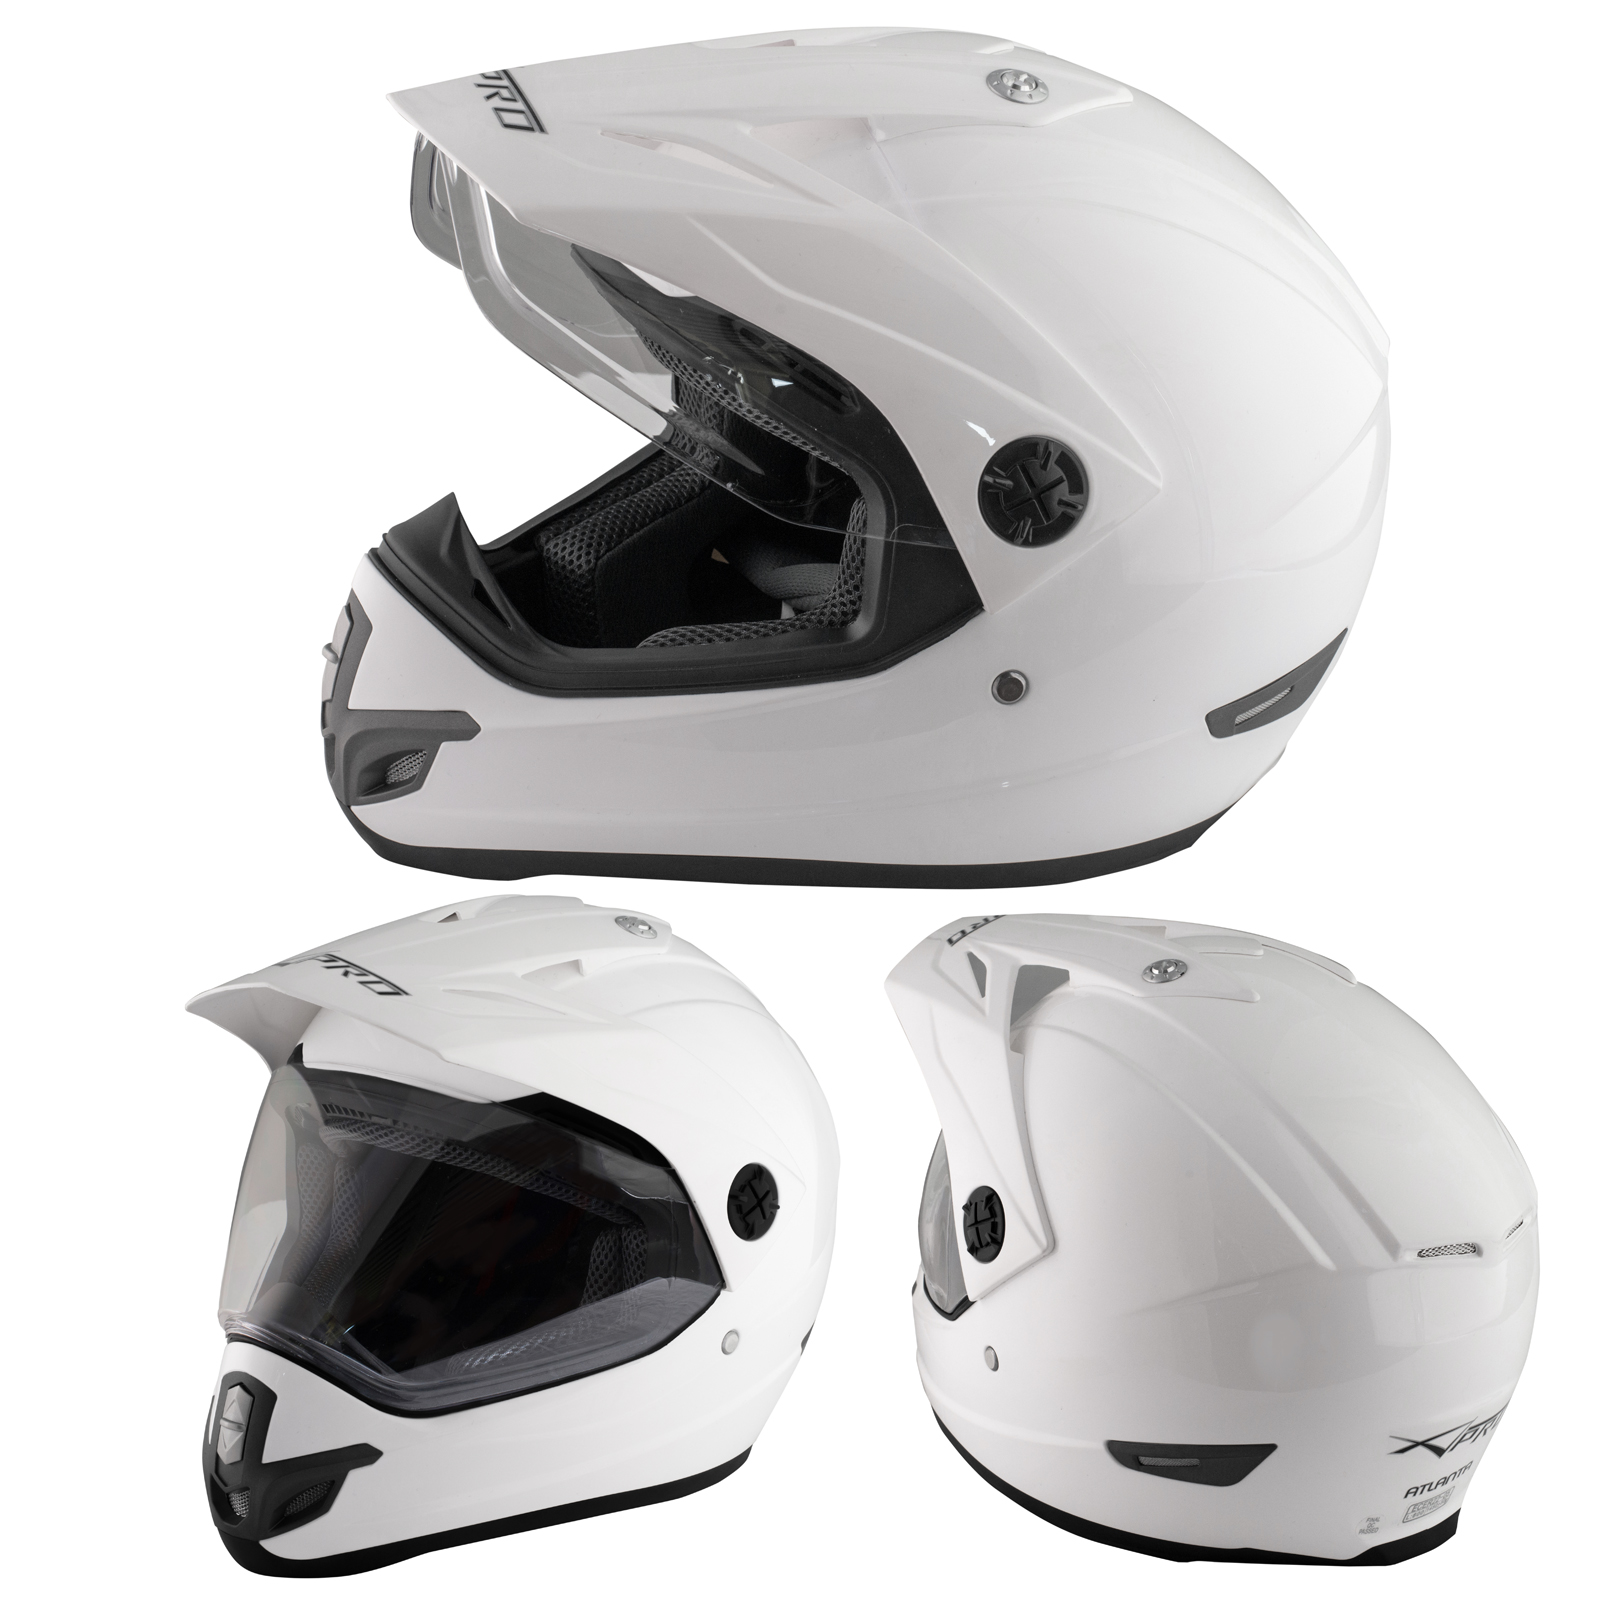 Casco-Motocross-Enduro-Trial-Quad-ATV-Motard-Visera-Anti-Niebla-Blanco